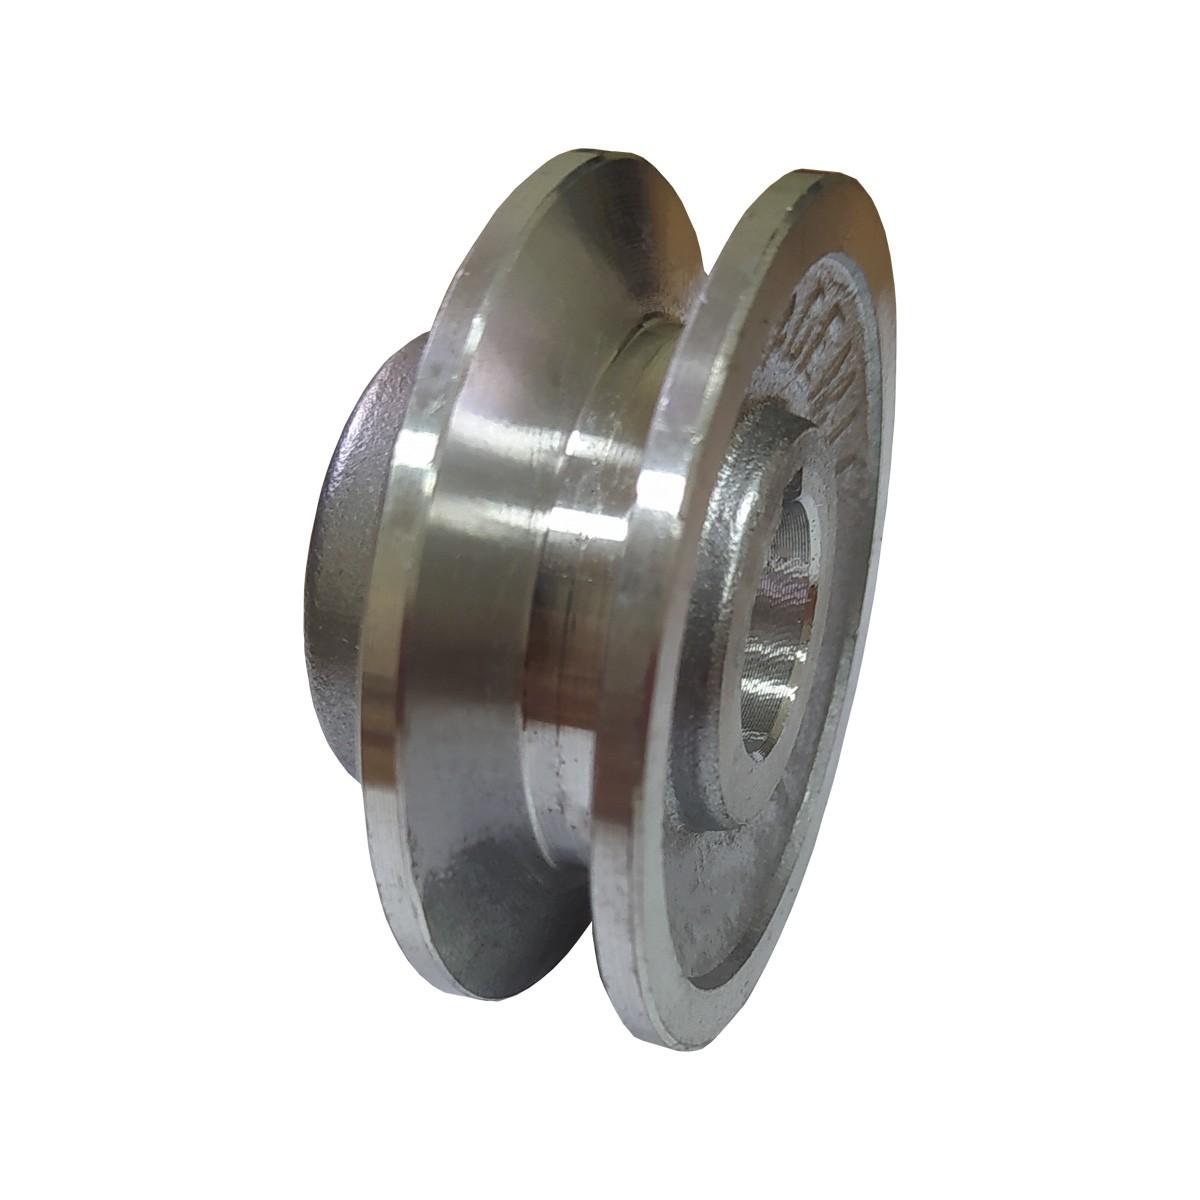 Polia De Aluminio 65mm Furo 19,05mm 1 Canal A Chaveta